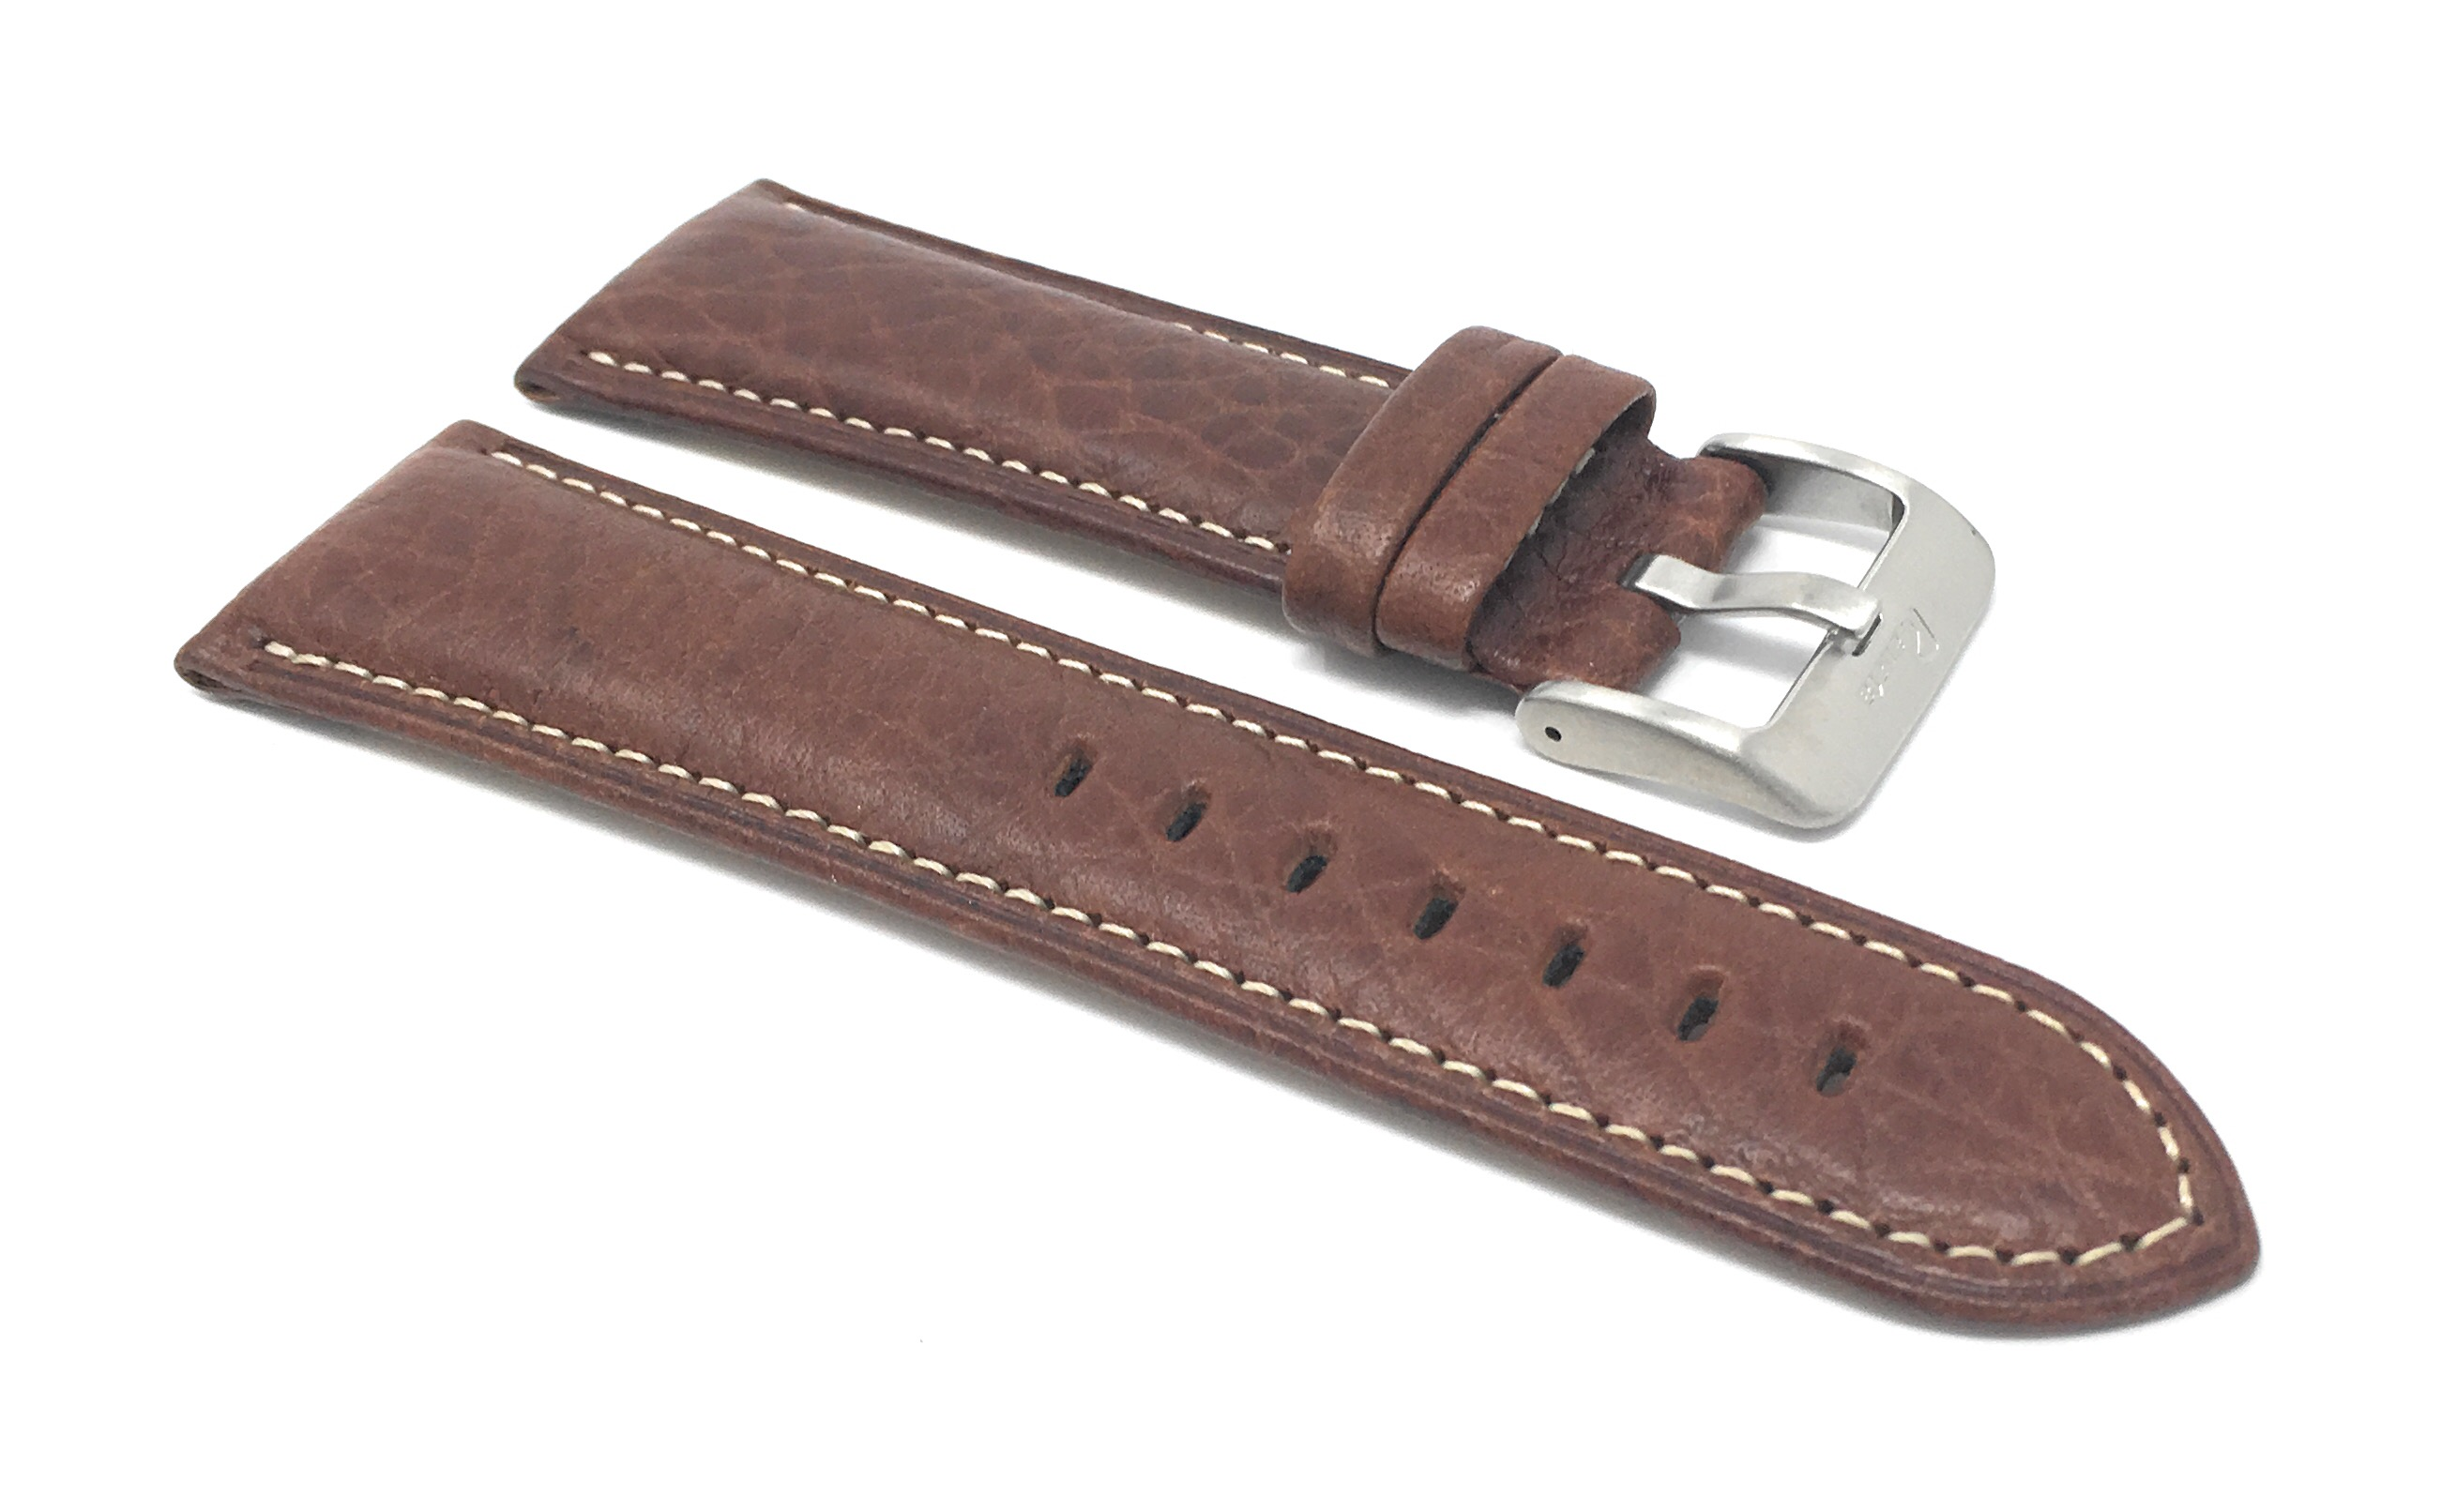 Bandini-Mens-Italian-Leather-Watch-Band-Strap-Padded-Stitch-18mm-19mm-20mm-24mm thumbnail 19